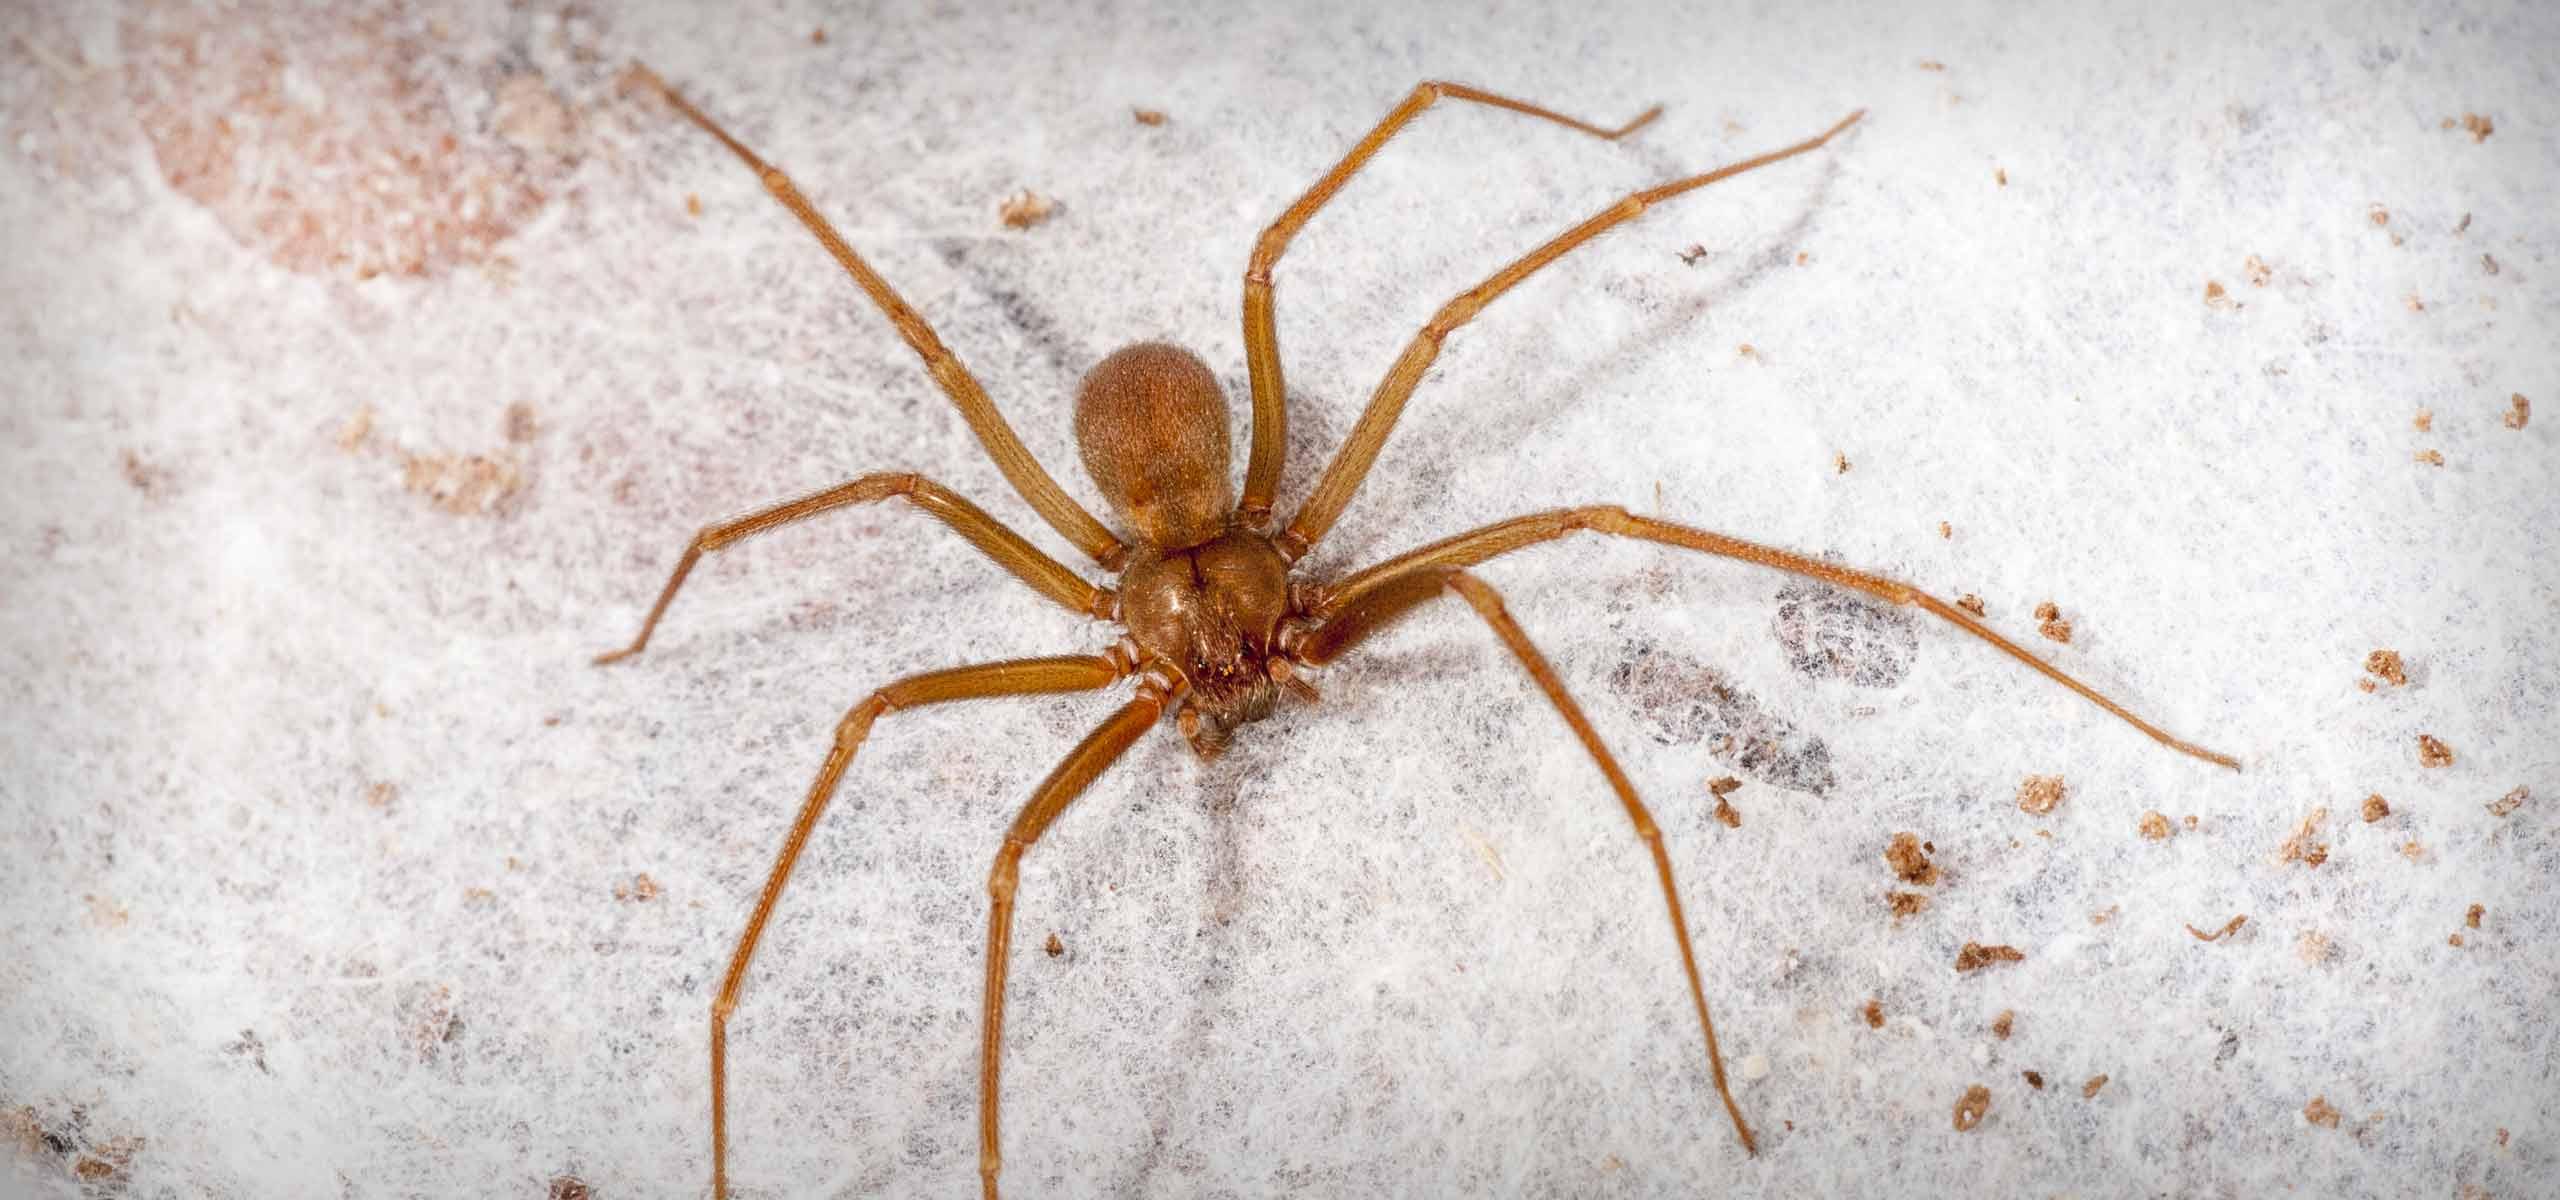 Spider Exterminator   Spider Control Services   Black Pest Prevention